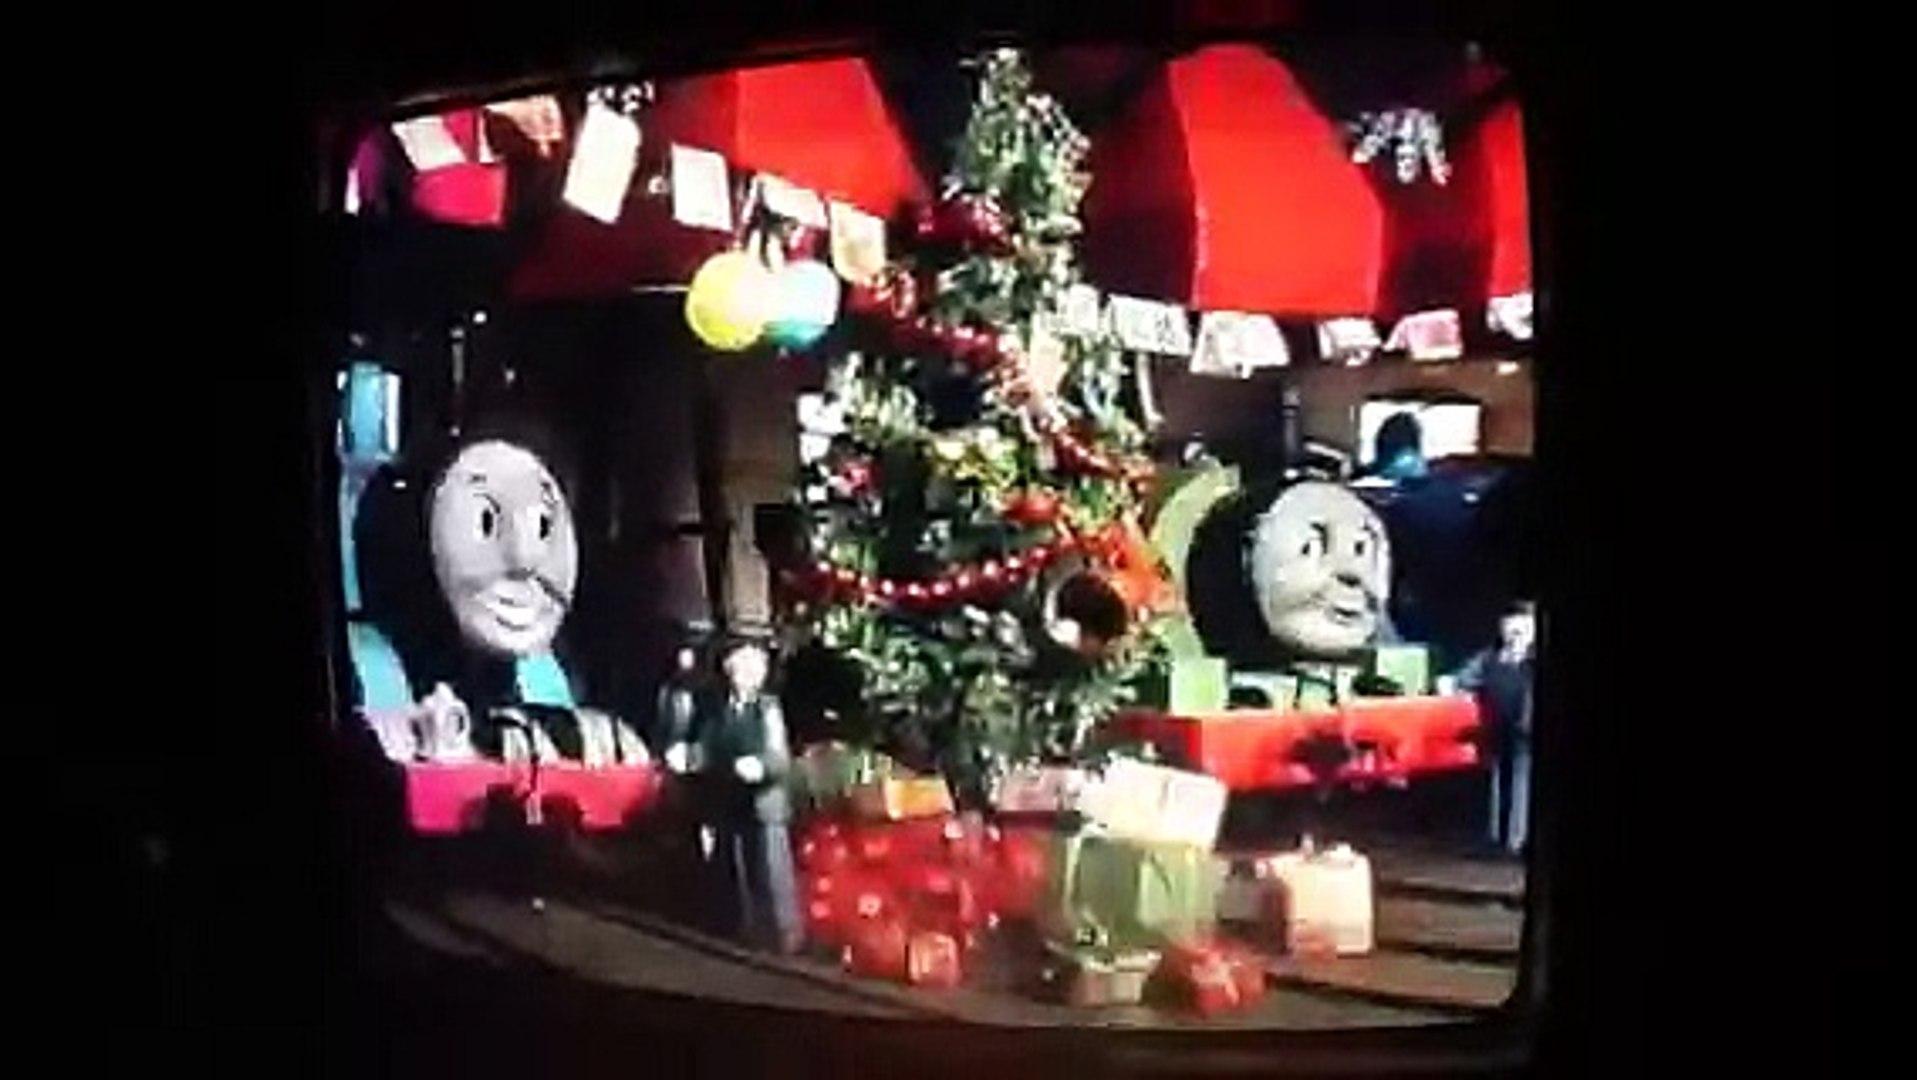 Thomas Christmas Wonderland Vhs.Episode 24 Ending Of Thomas And Friends Thomas Christmas Party And 17 Other Stories